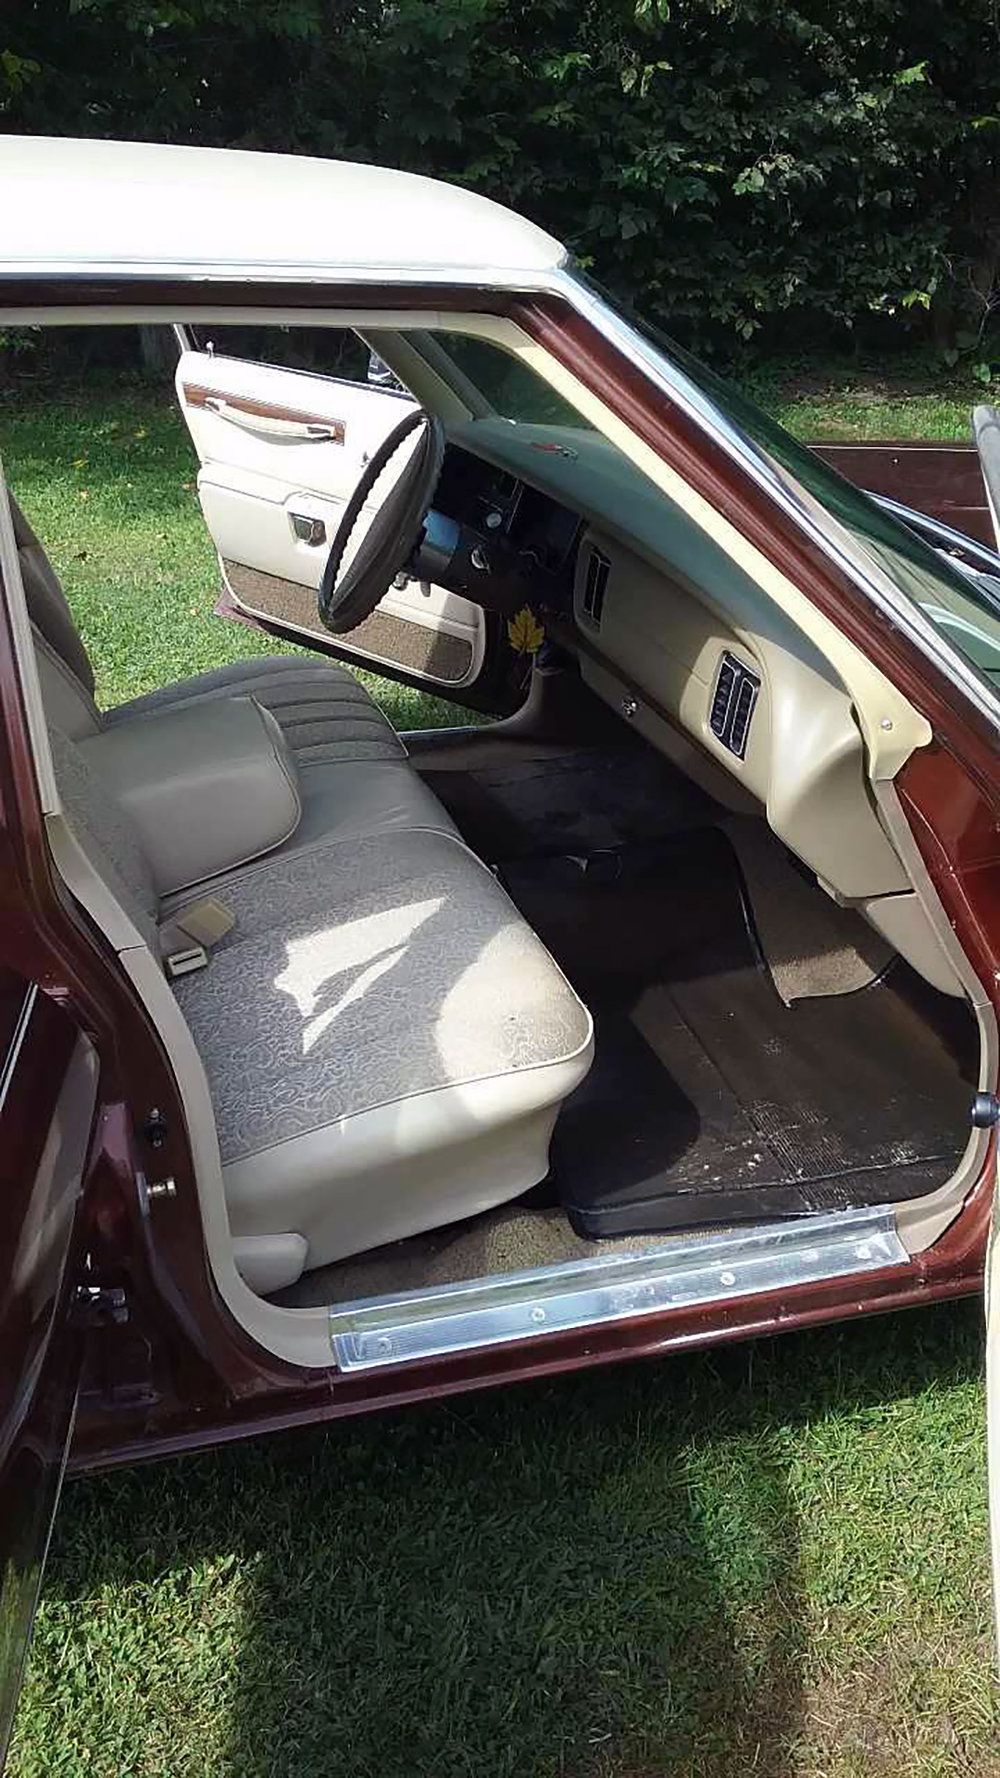 10 1977 Dodge Royal Monaco Brougham.jpg